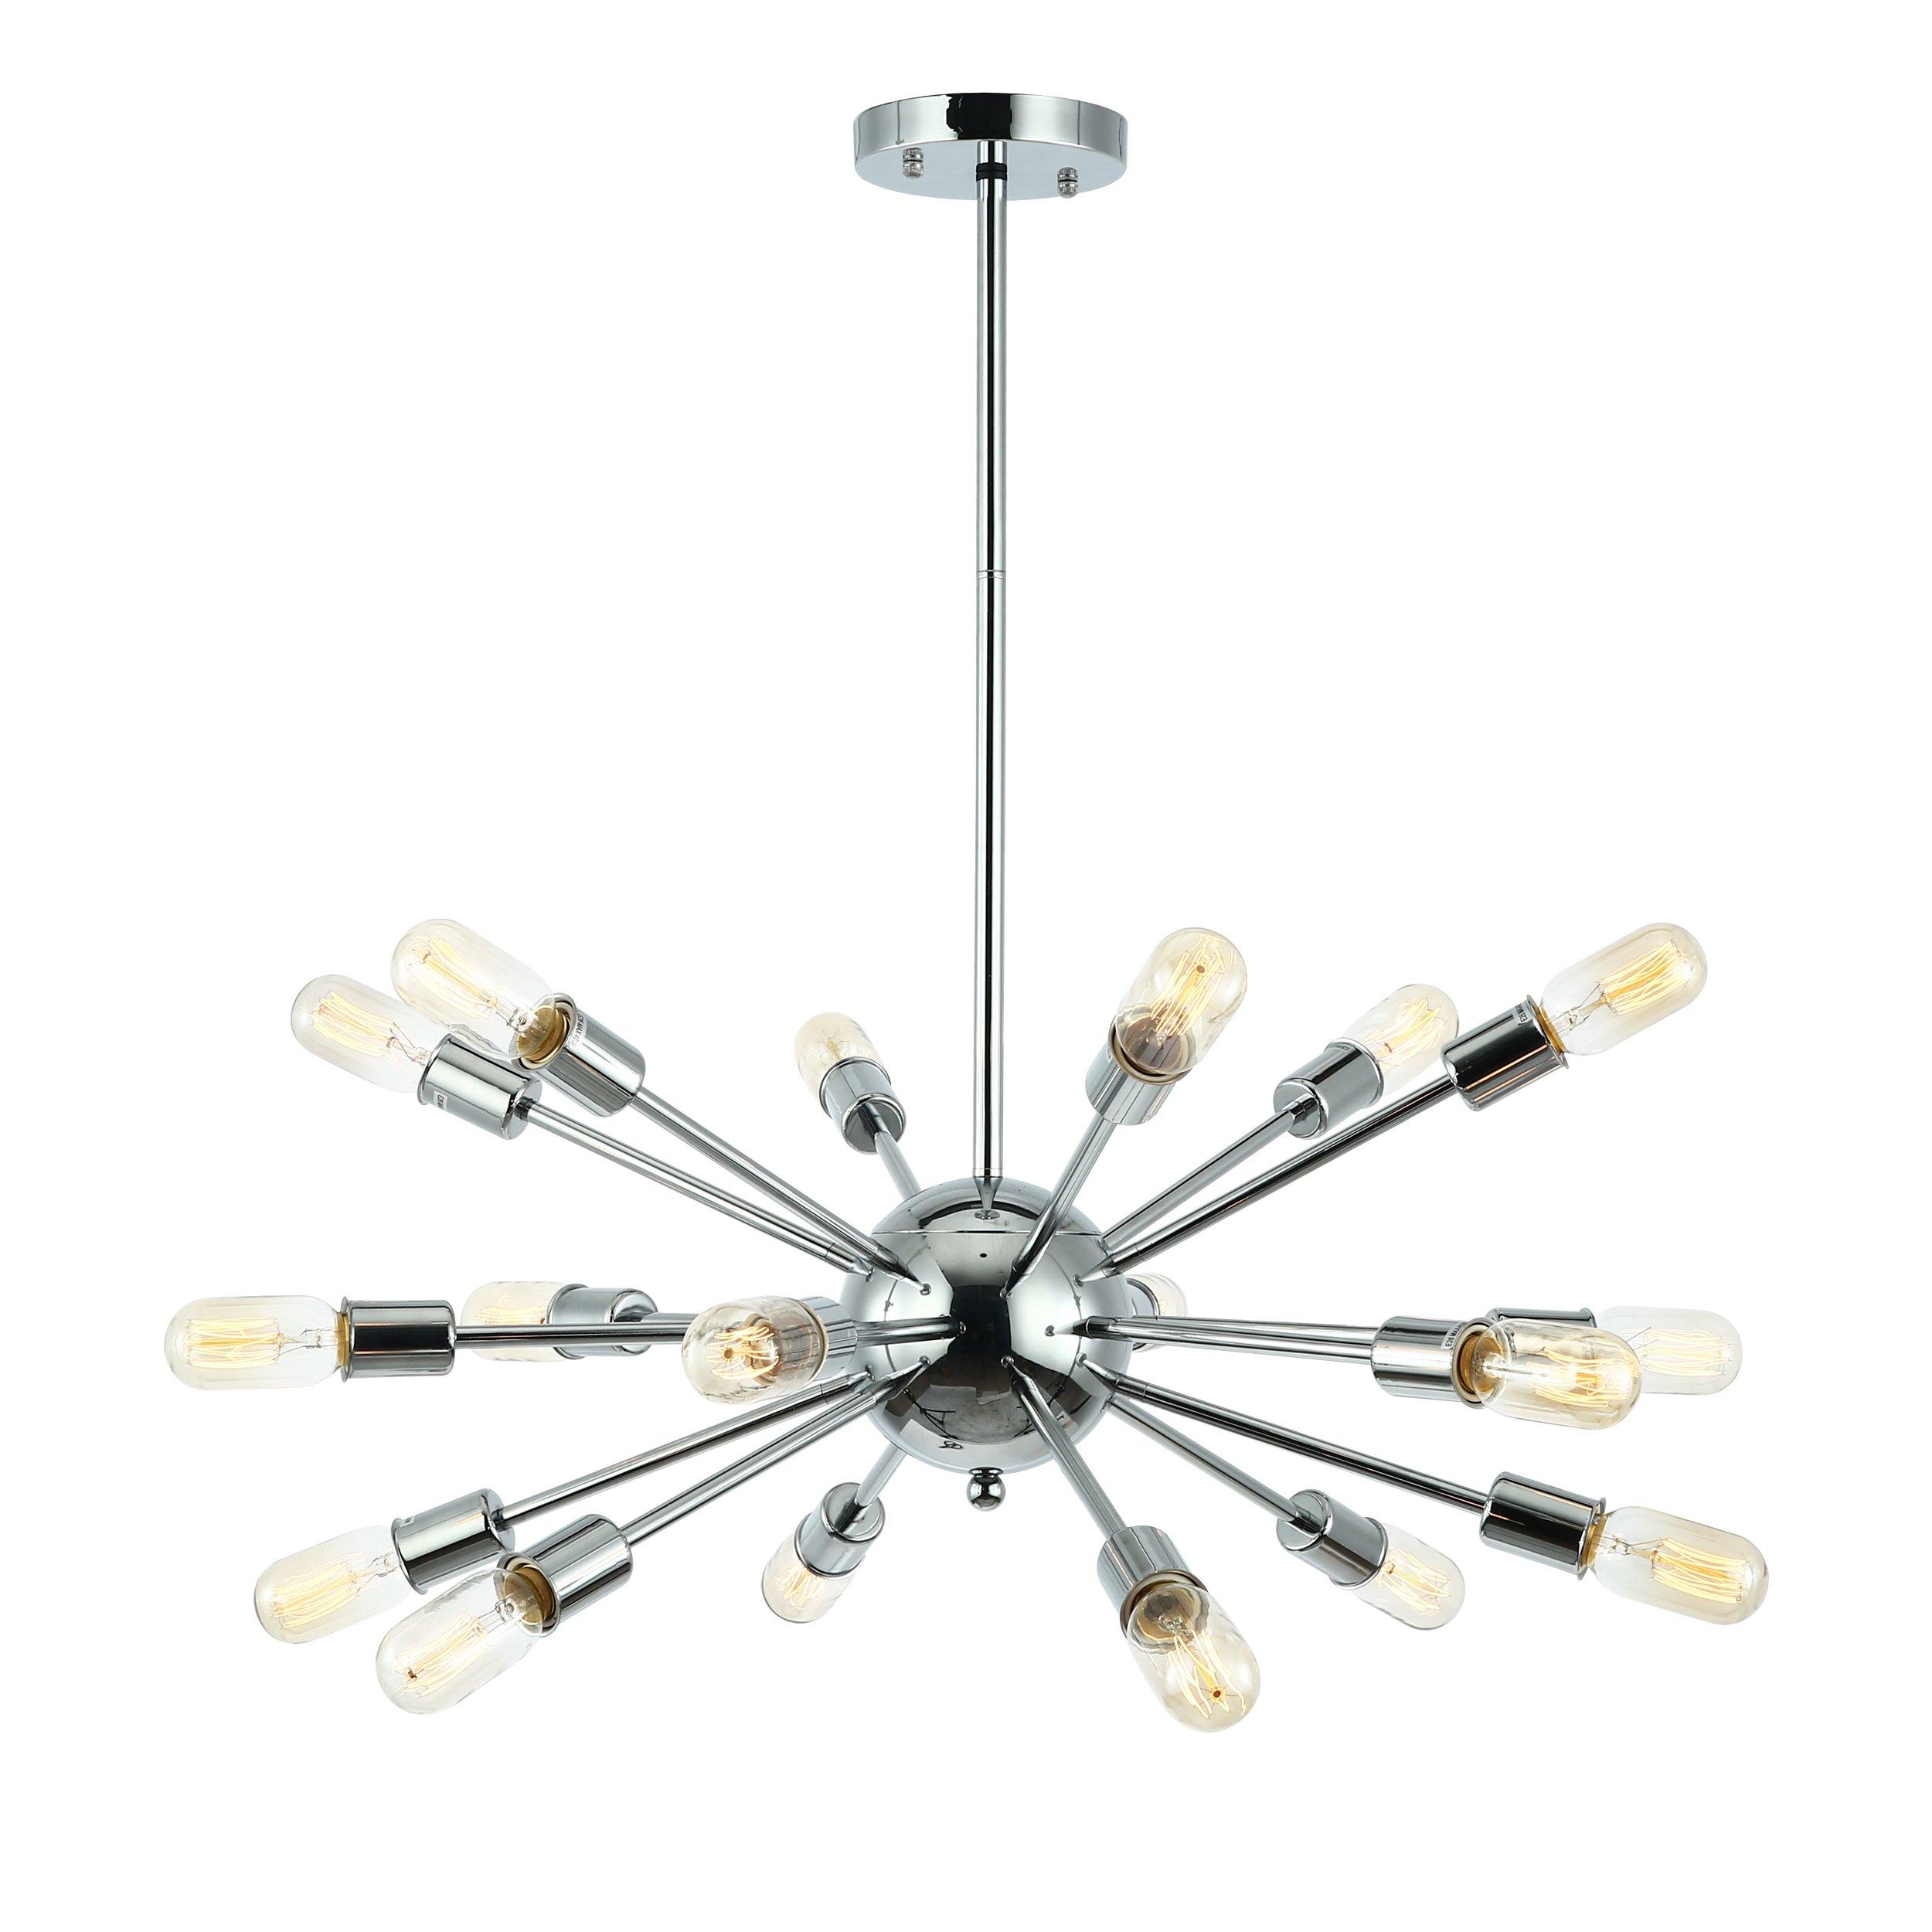 Light Society Sputnik 18-Light Chandelier Pendant, Chrome, Mid Century Modern Industrial Starburst-Style Lighting Fixture (LS-C115-CRM)